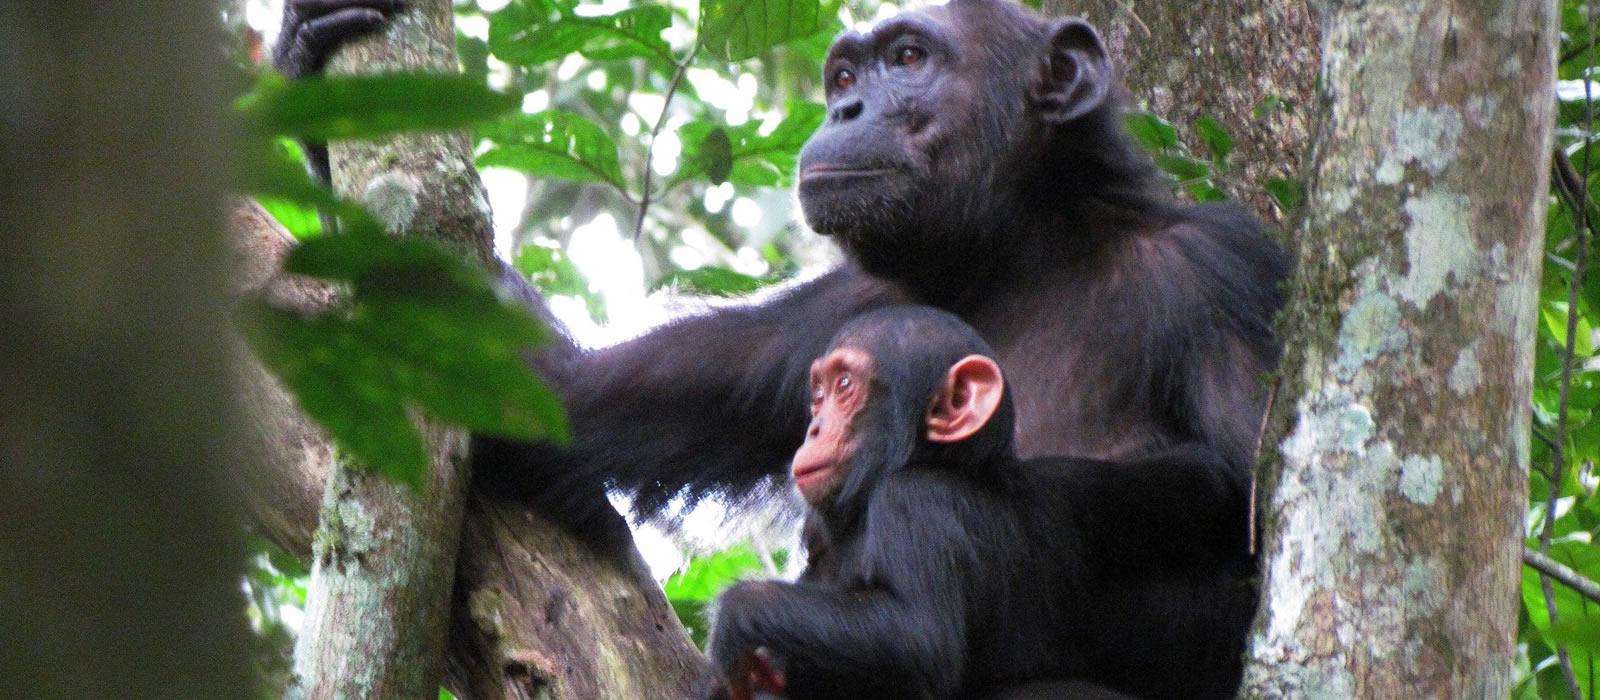 a Chimpanzee in Kibale forest National park - 14 days gorilla safari and wildlife safari